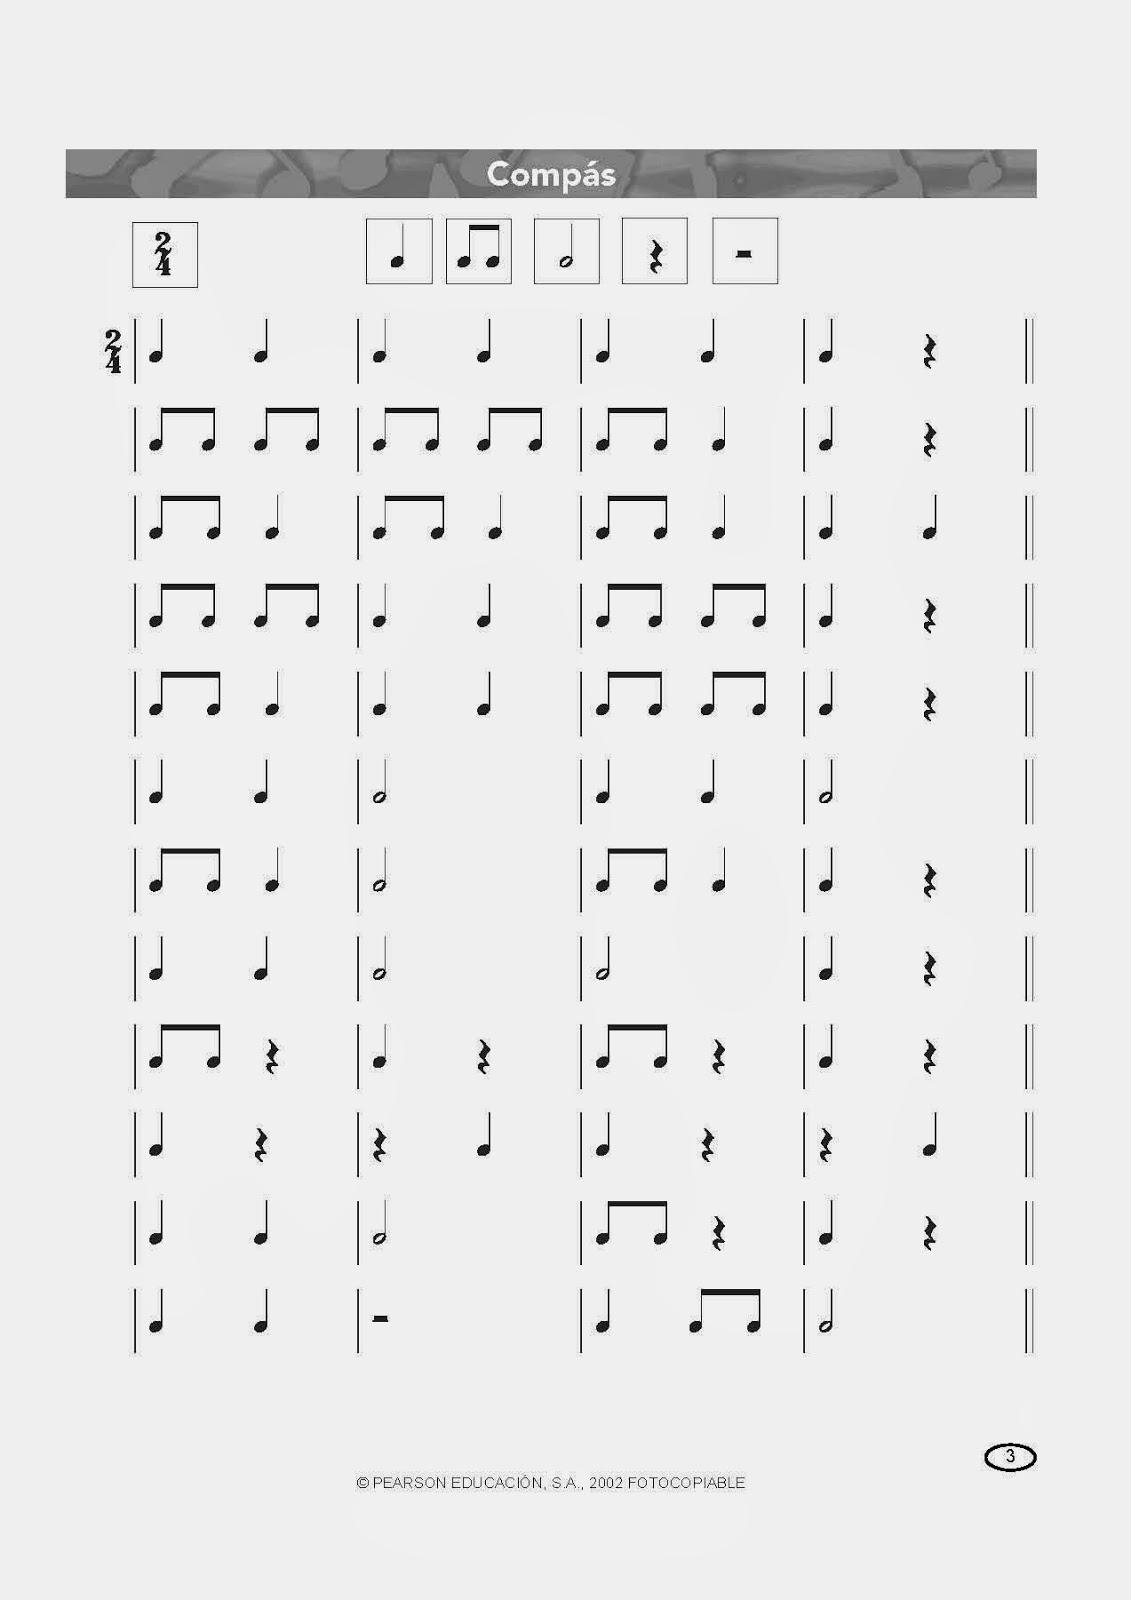 ejercicios lenguaje musical: